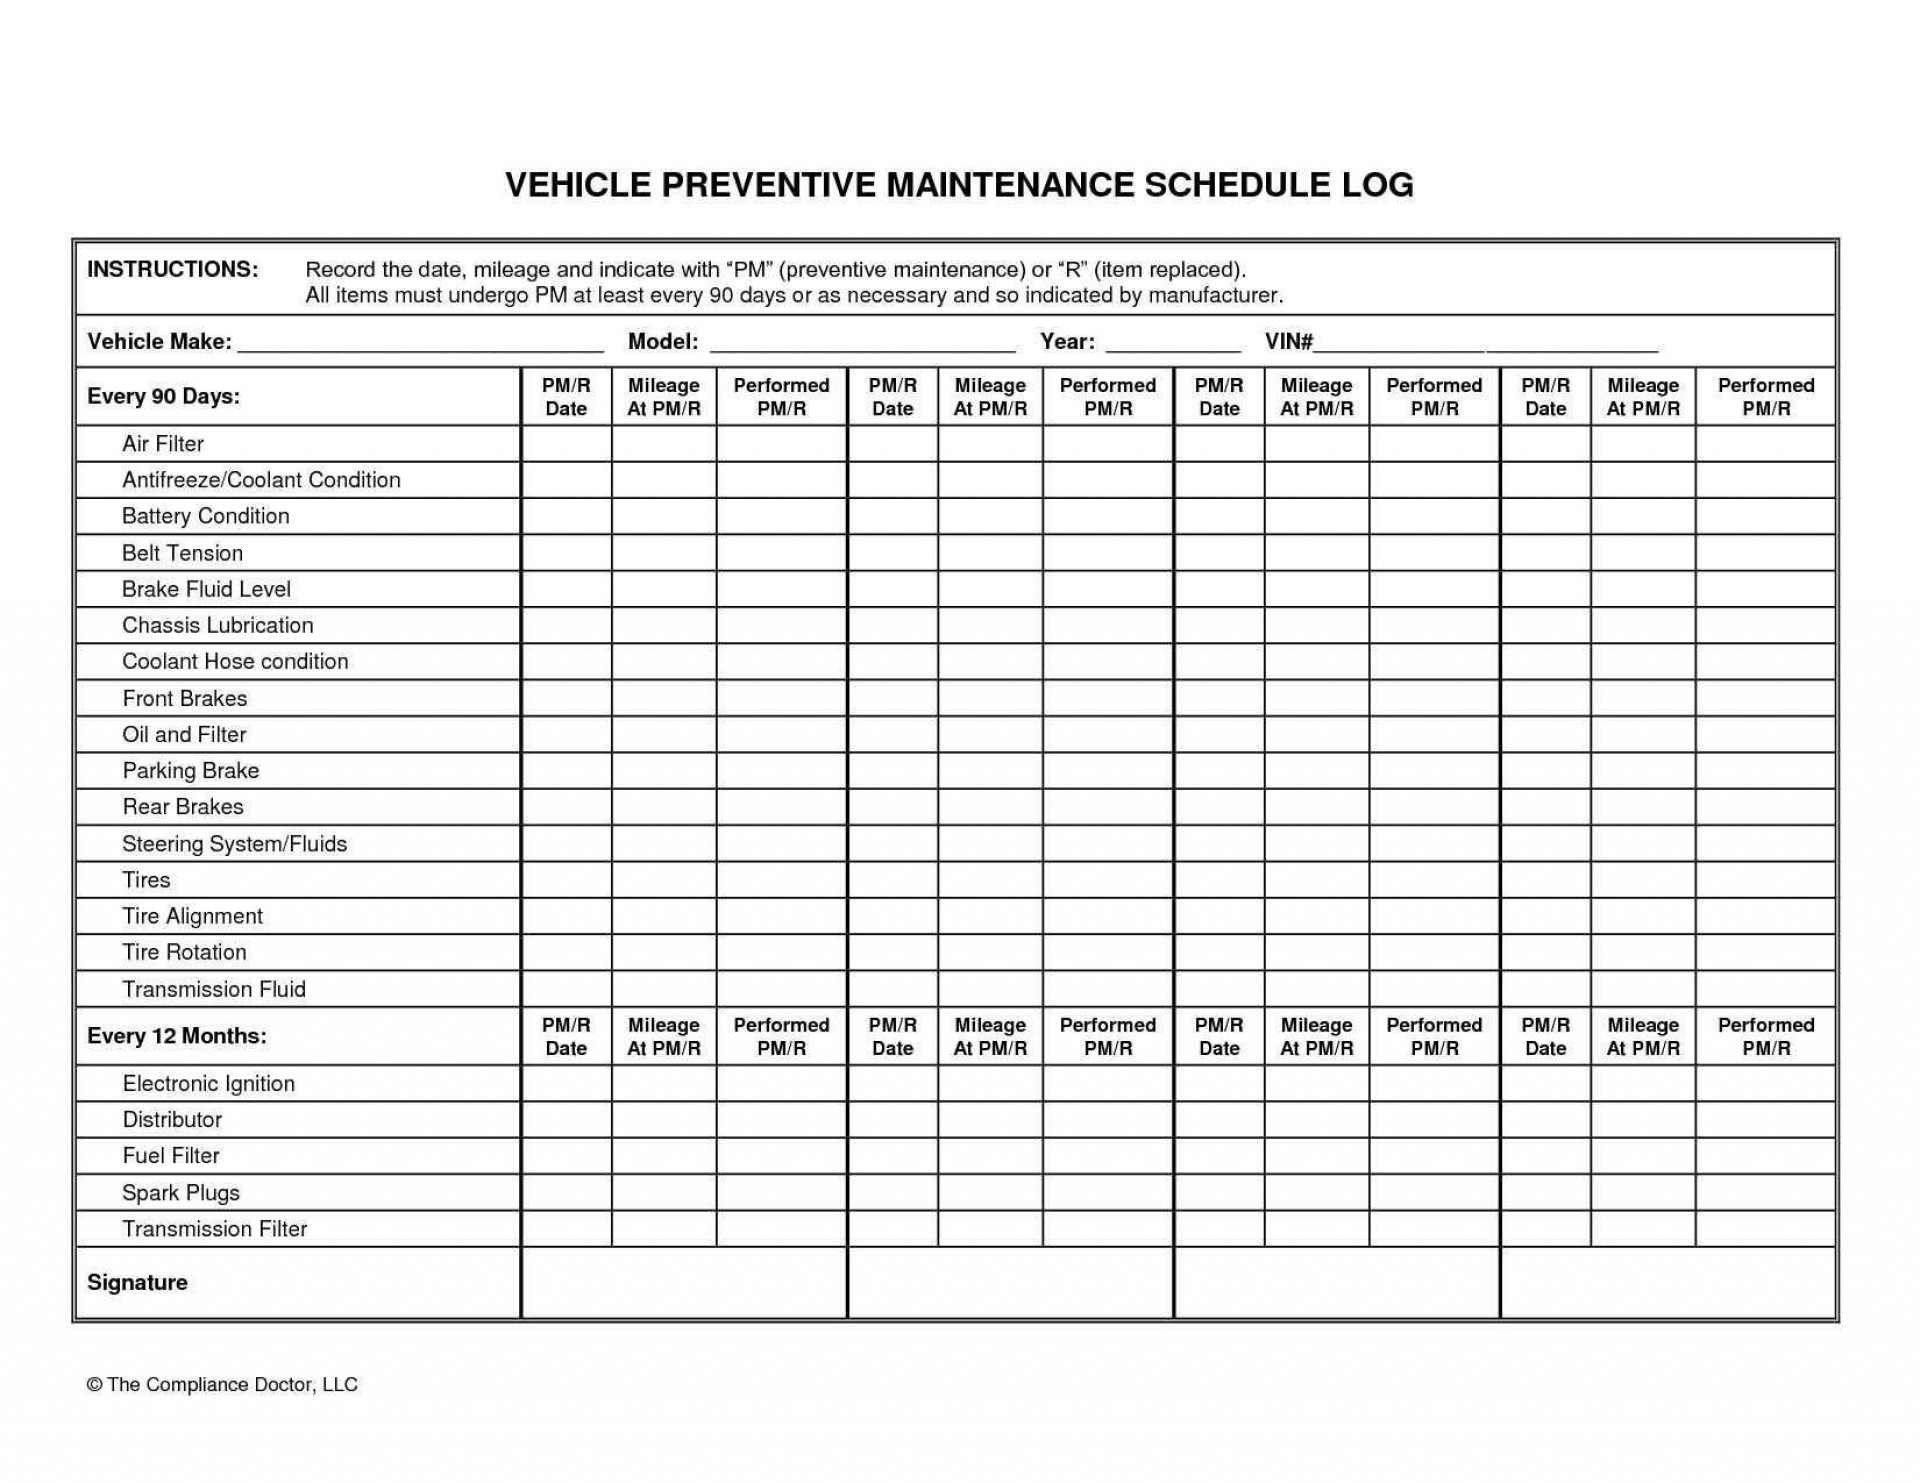 004 Stirring Preventive Maintenance Template Excel Download Inspiration  Computer1920